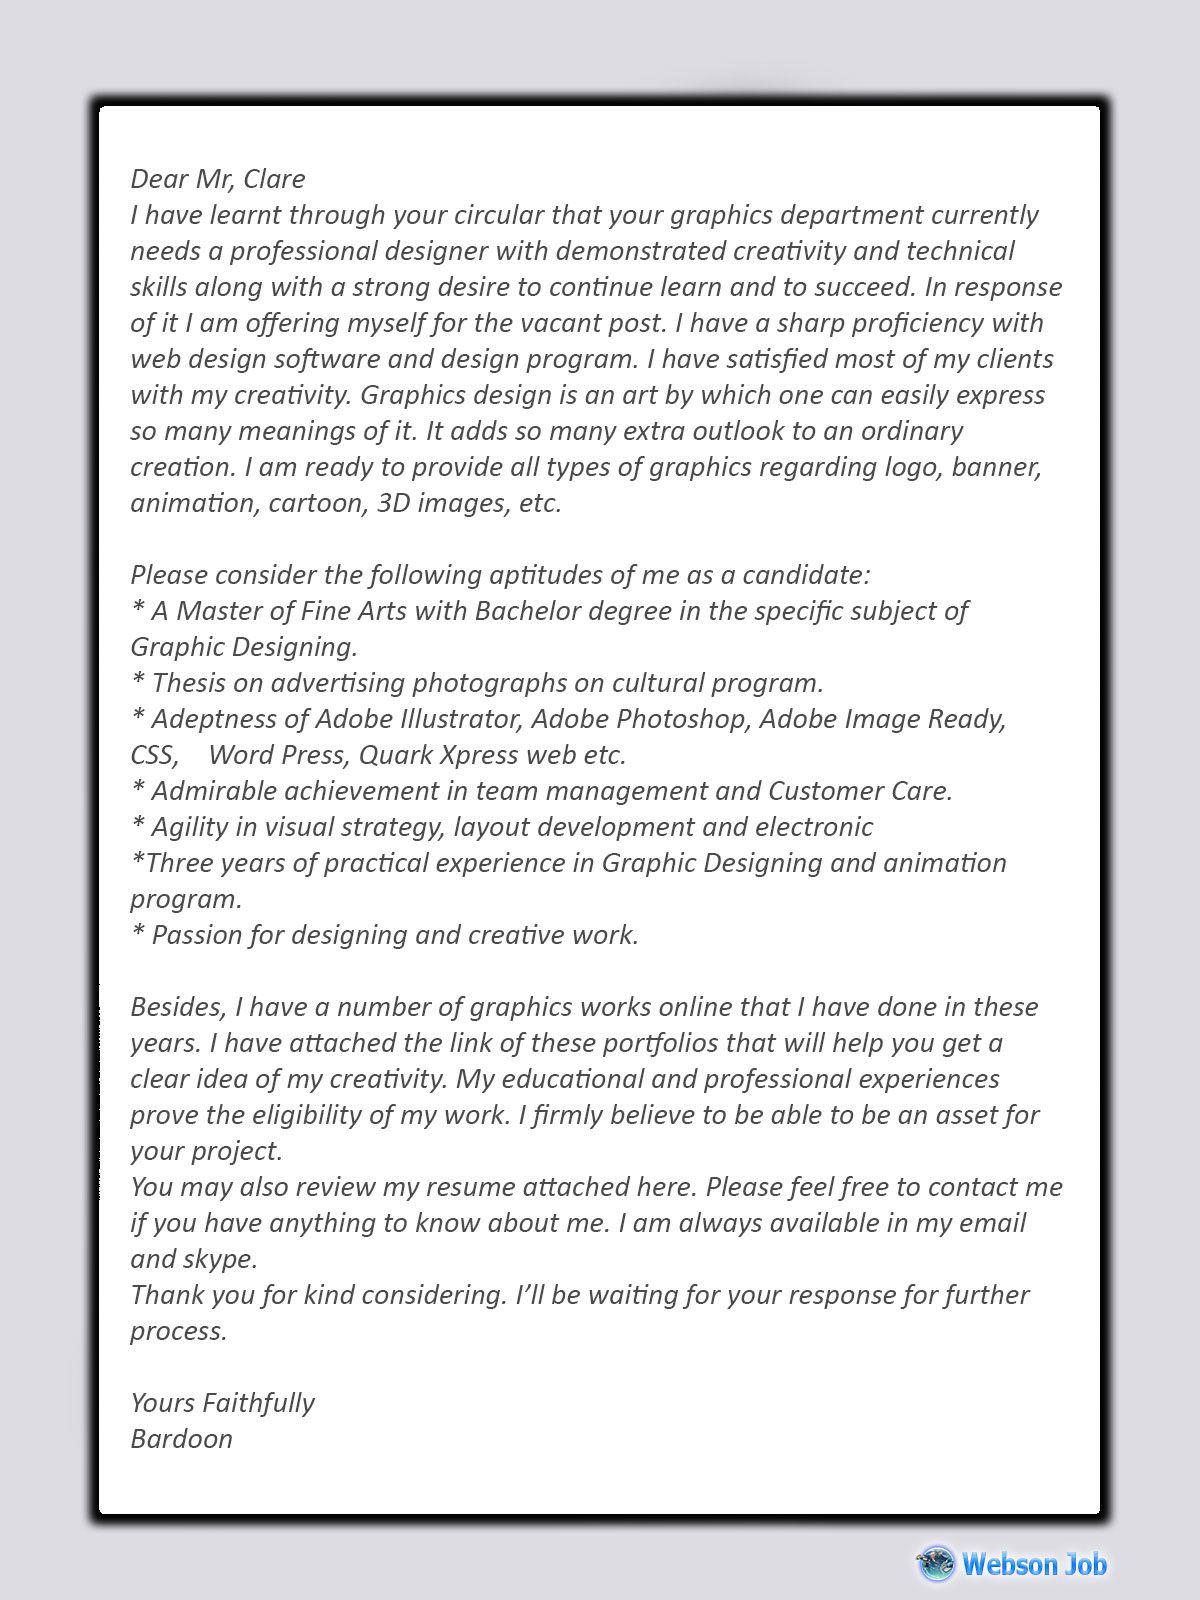 Upwork Cover Letter Sample For Graphic Designer In 2020 Cover Letter Sample Cover Letter Tips Letter Sample